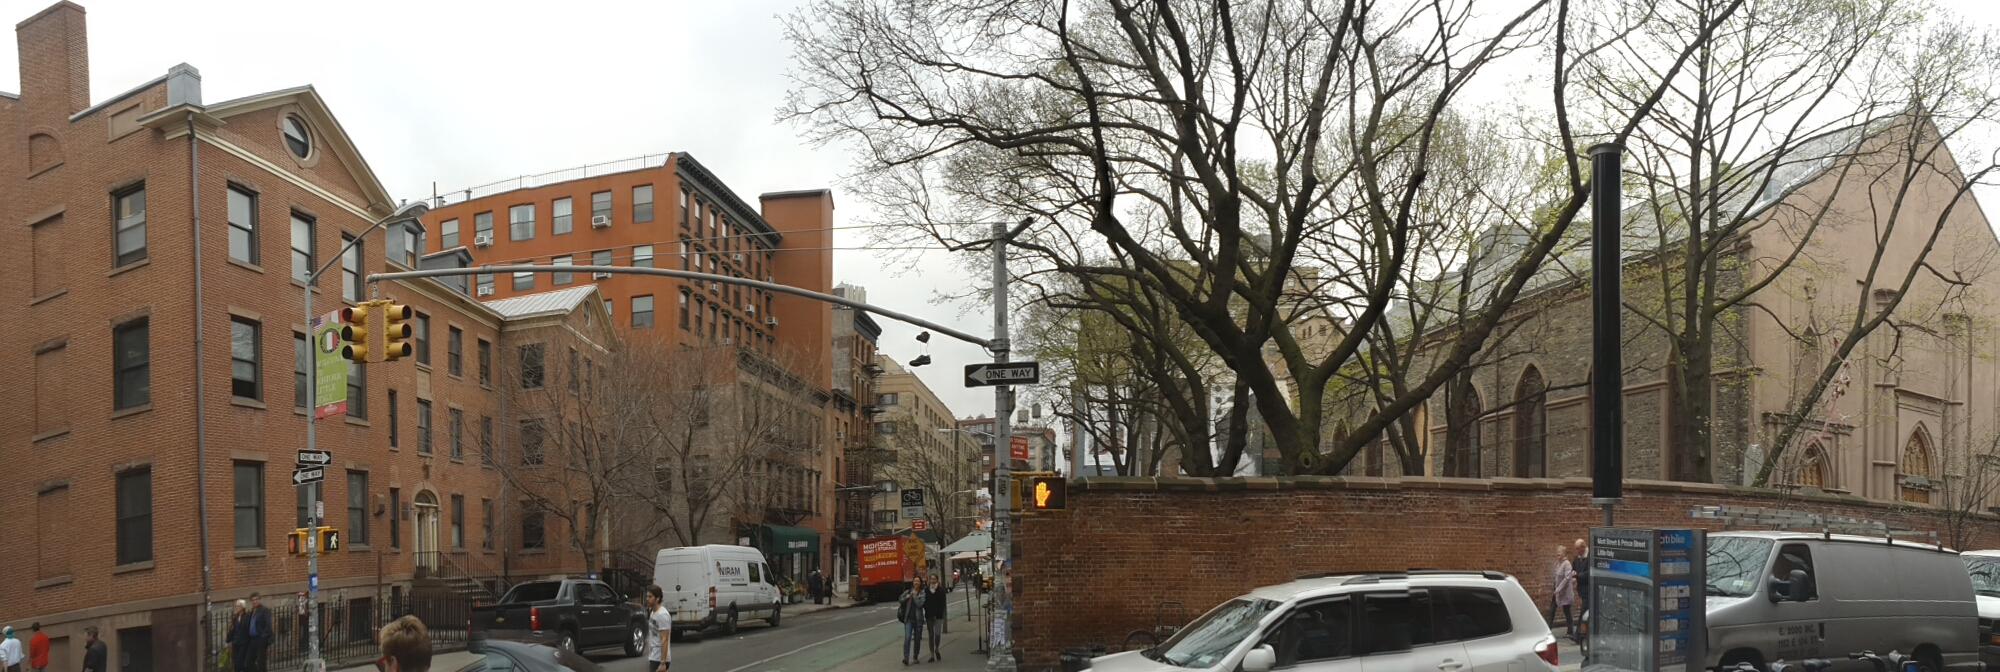 Prince Street corner of Mott Street, spring 2015